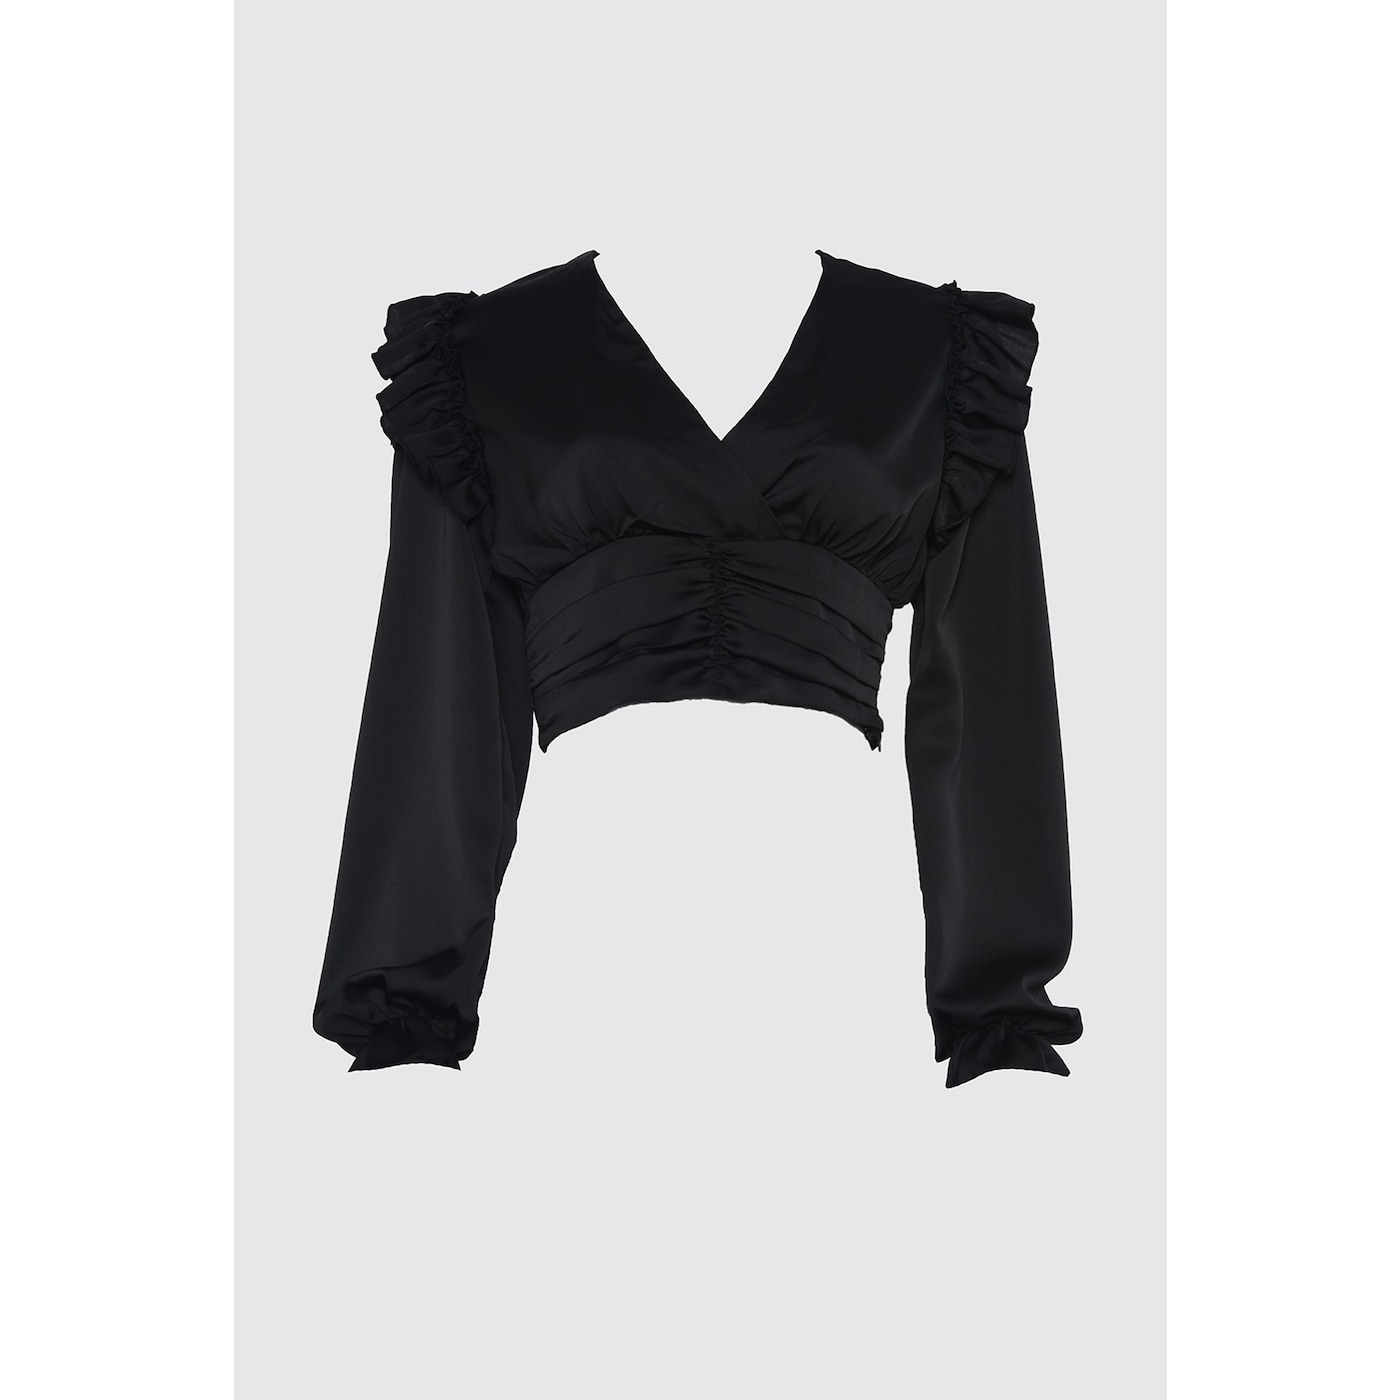 Trendyol Satin Blouse with Black Ruffin Detail dámské 40